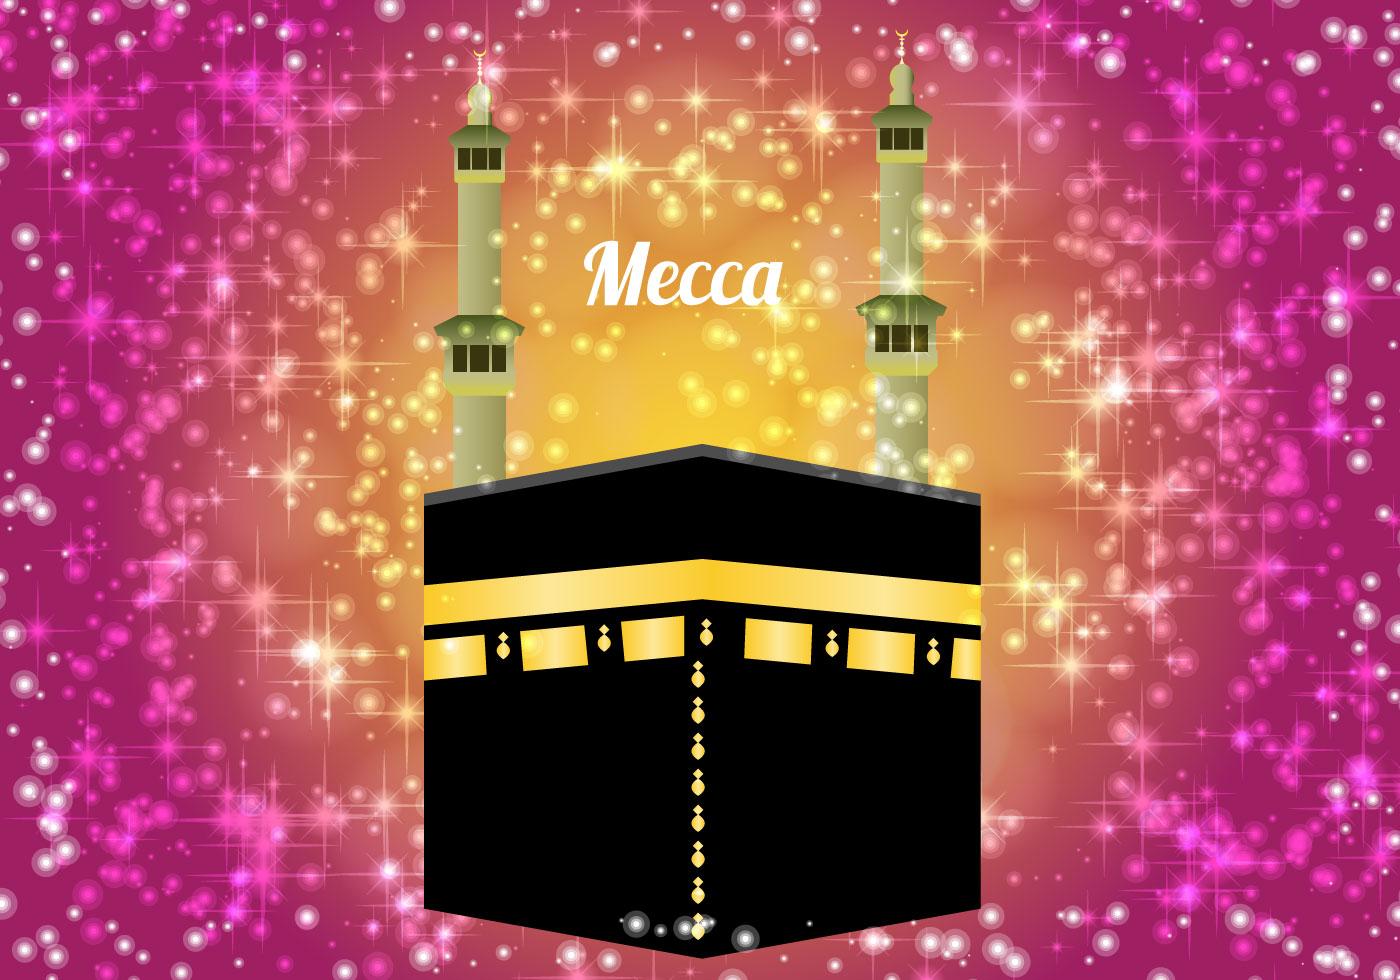 Free Mecca Vector Download Free Vector Art Stock